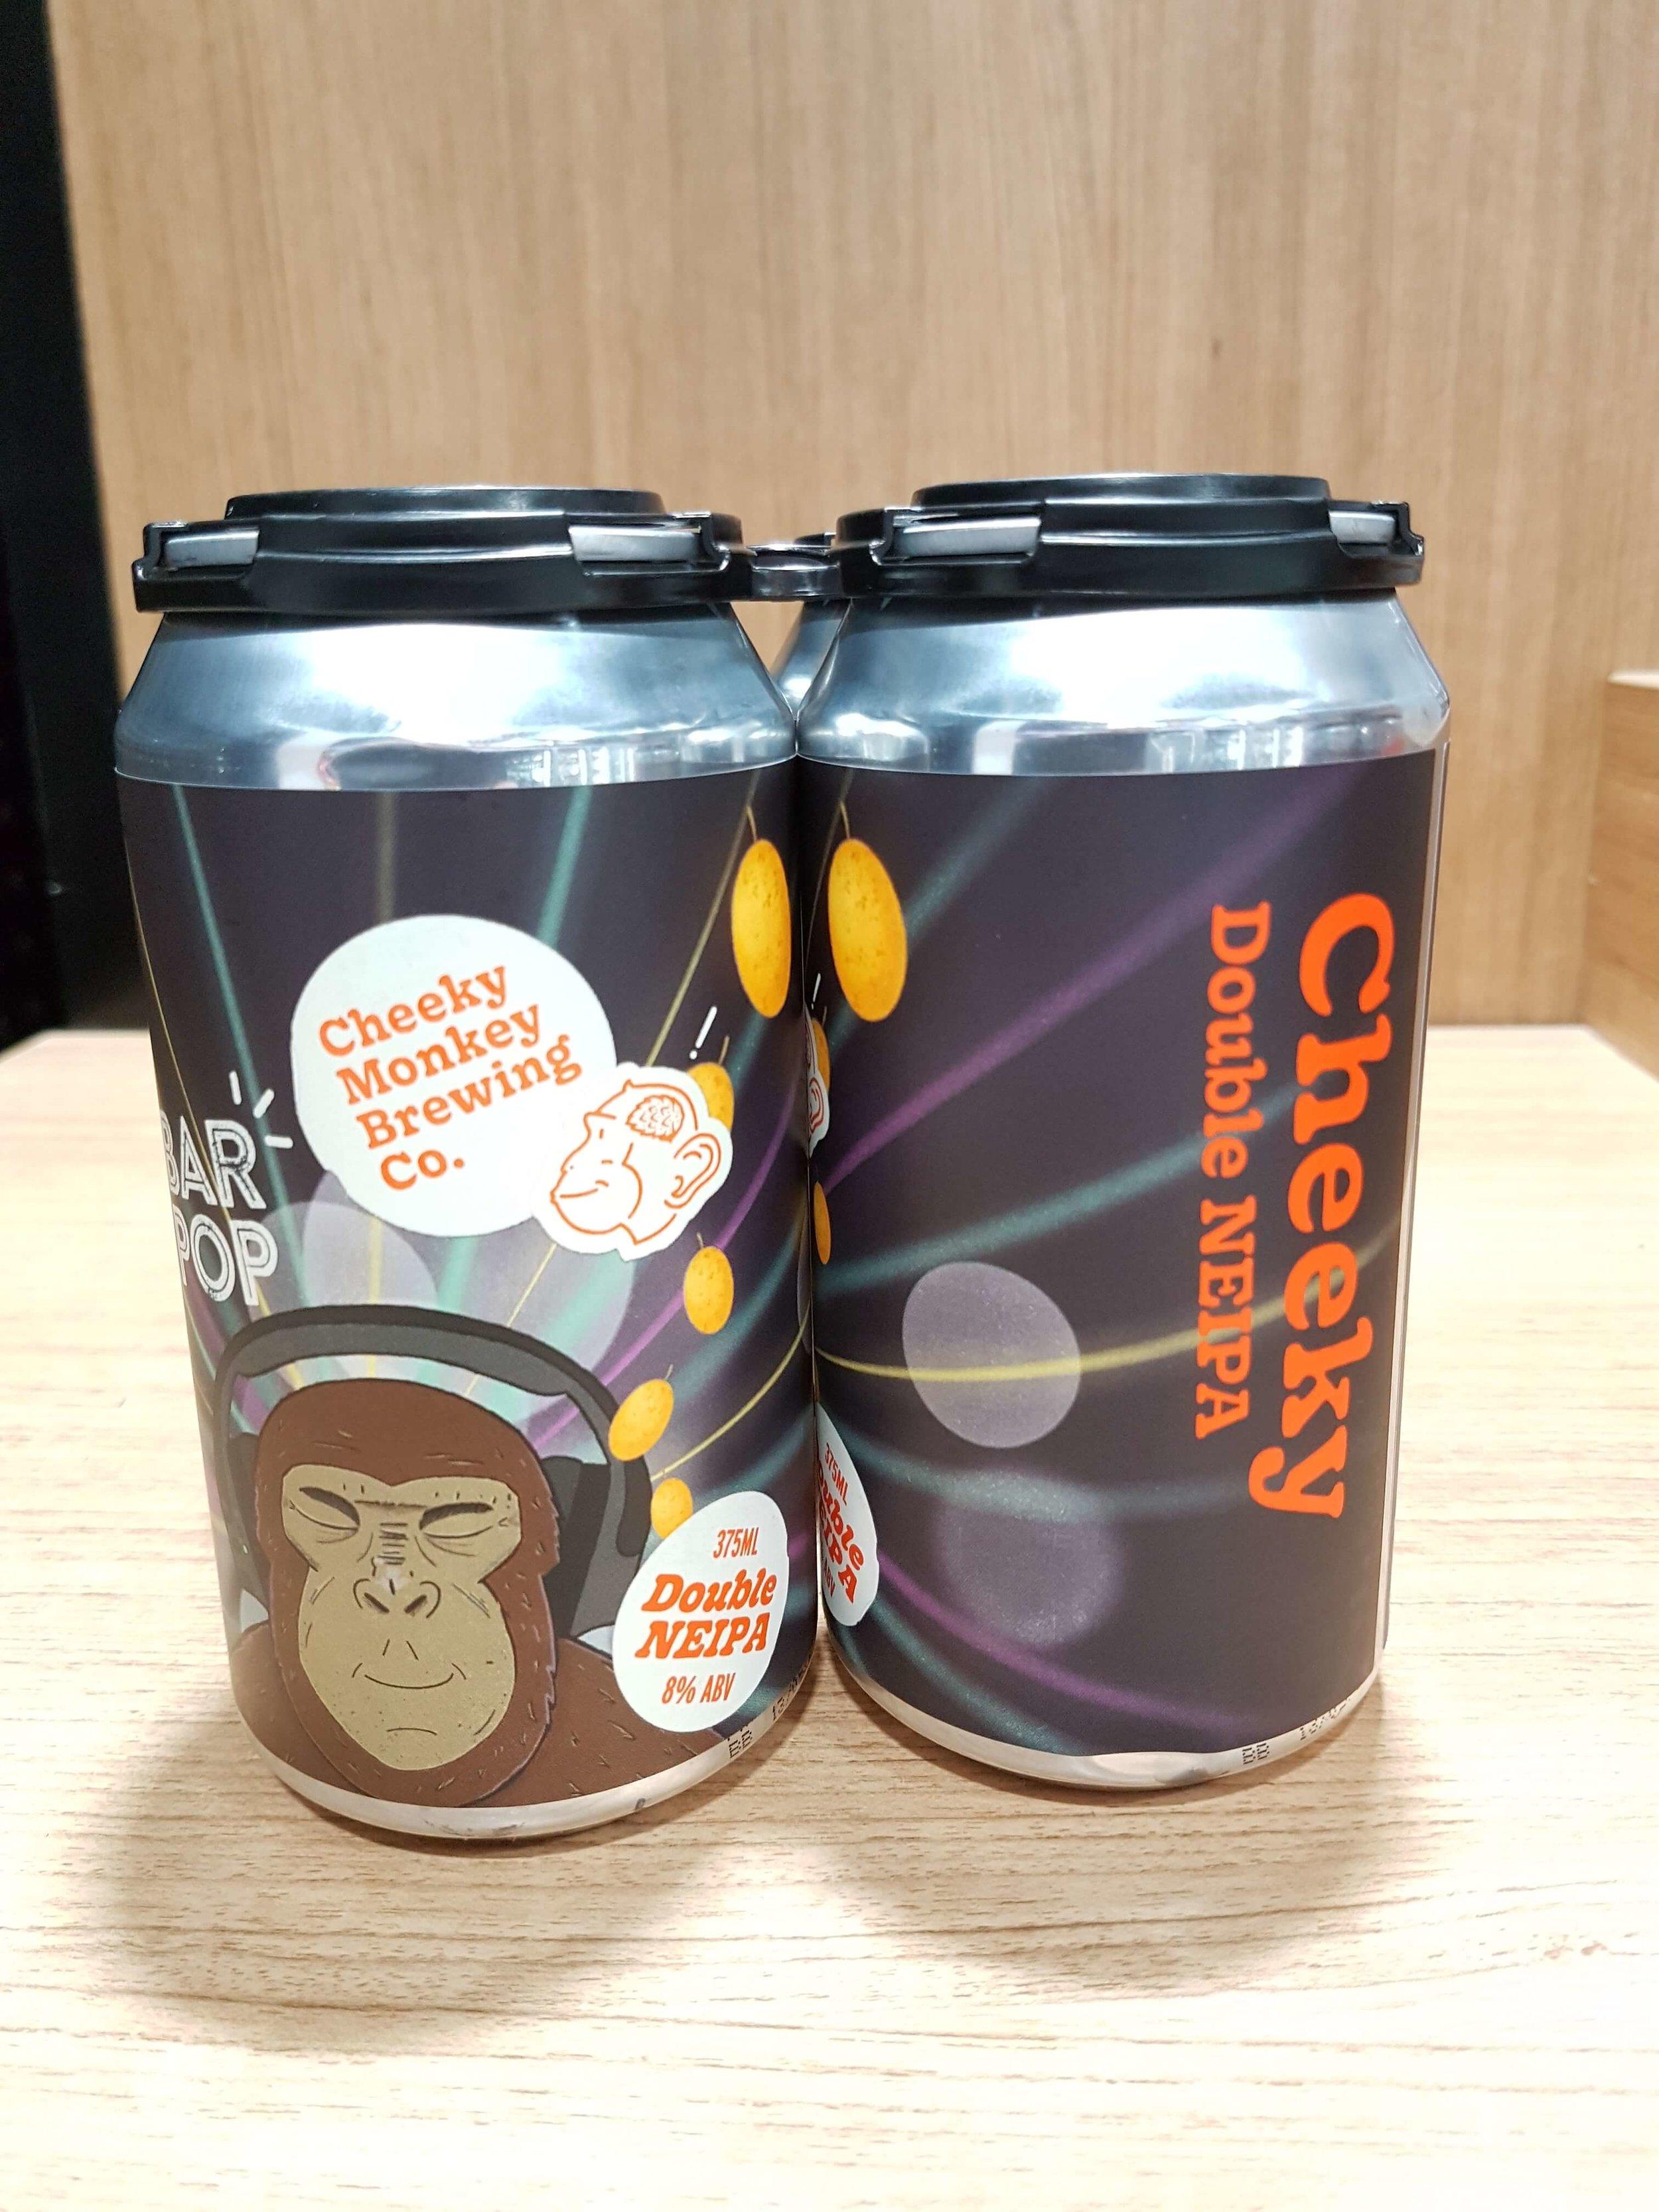 cheeky-monkey-double-neipa (1).jpg